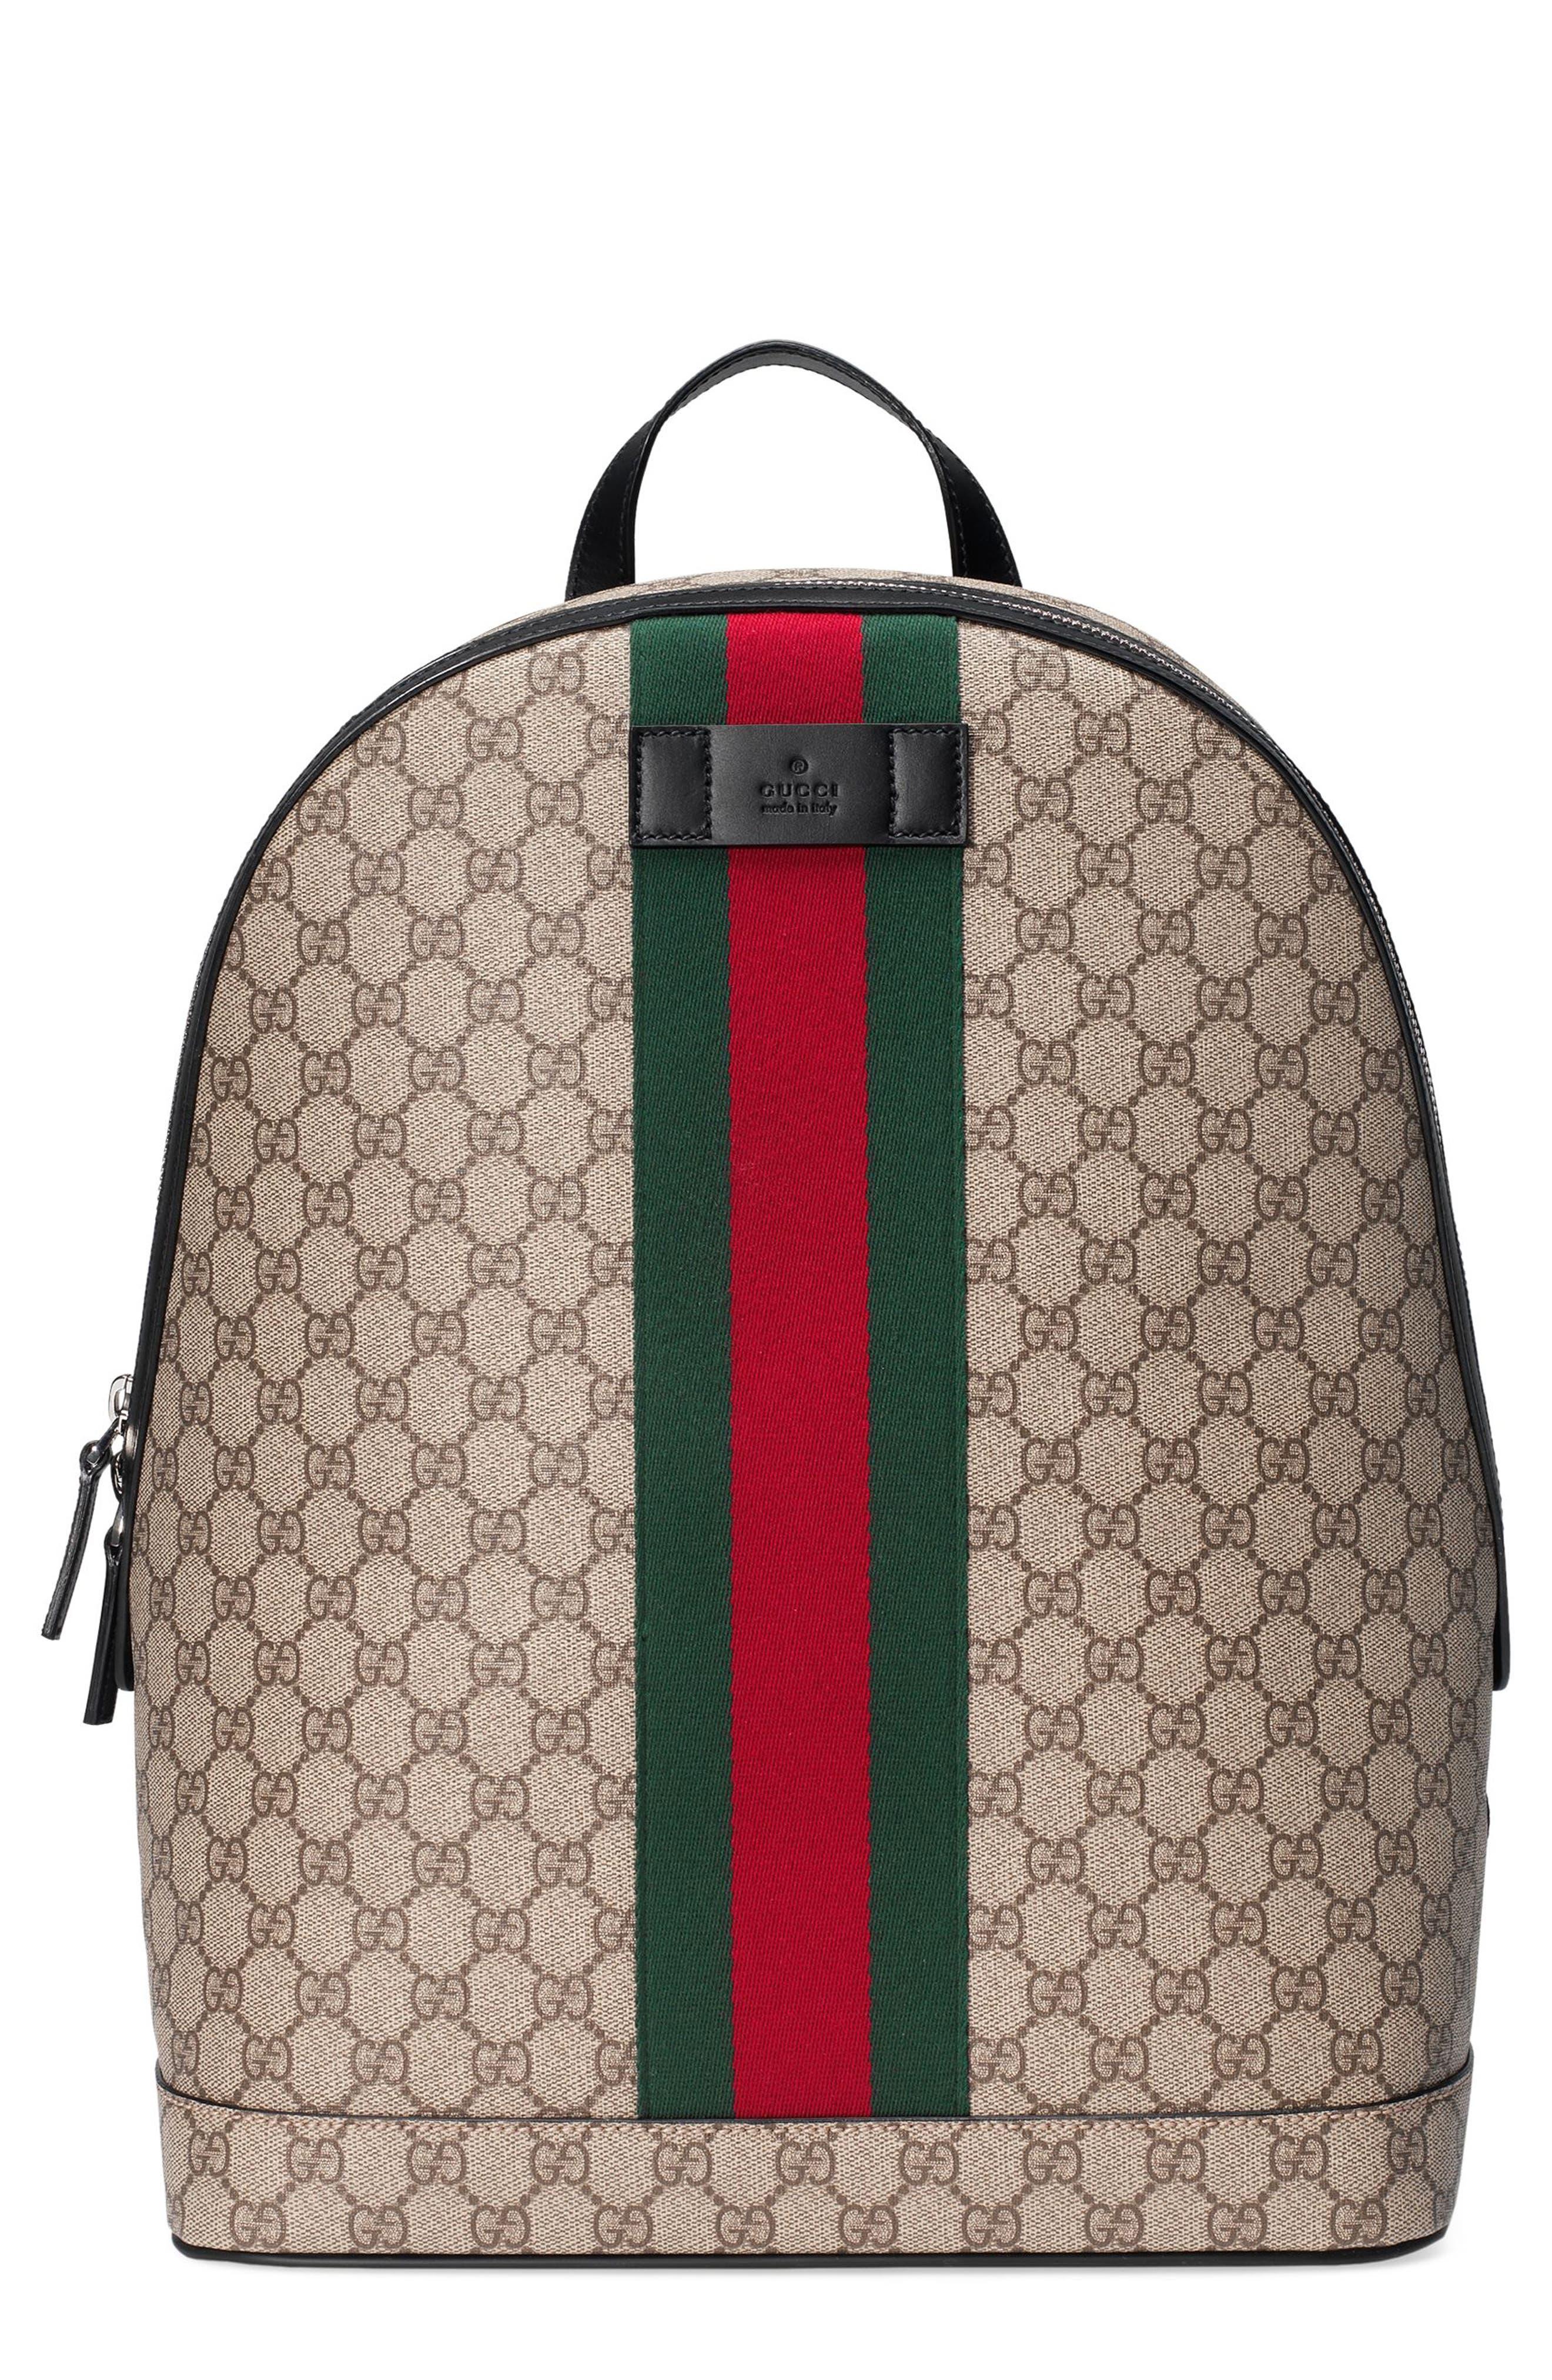 Supreme Stripe Backpack,                             Main thumbnail 1, color,                             283